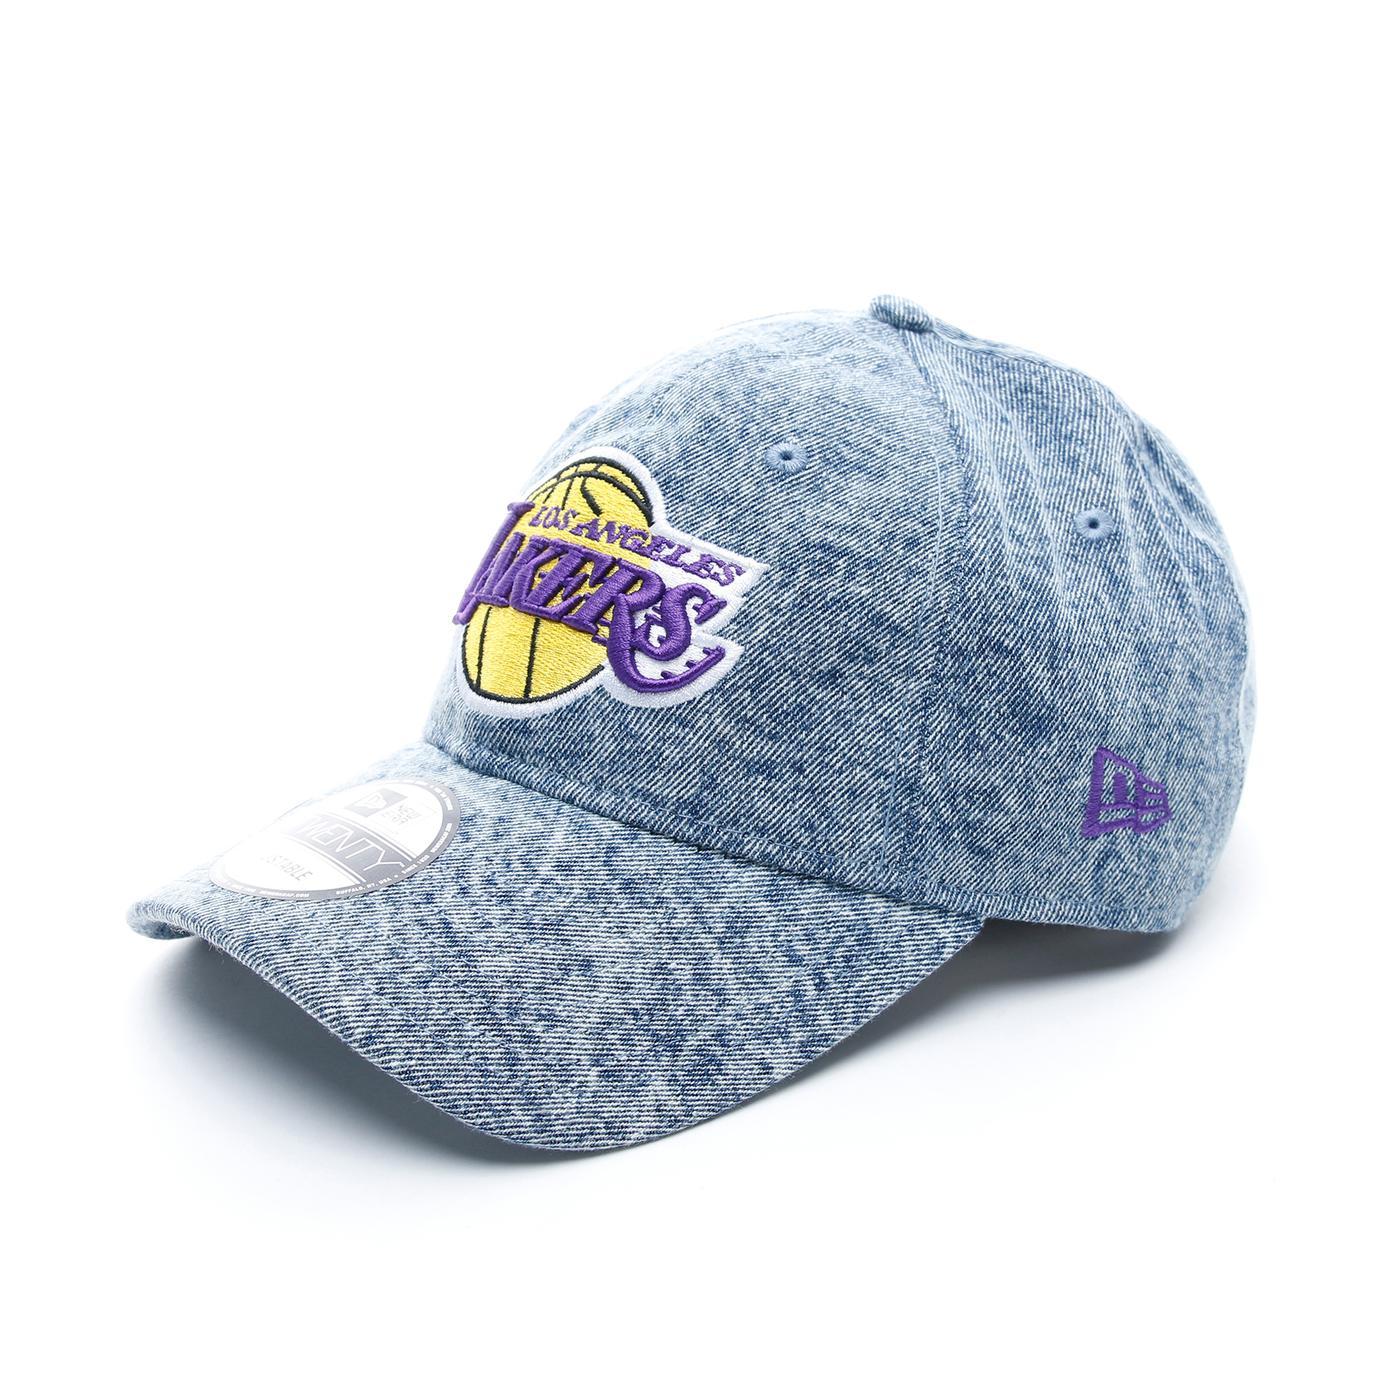 New Era NBA Los Angeles Lakers Dipped Denim Unisex Gri Şapka